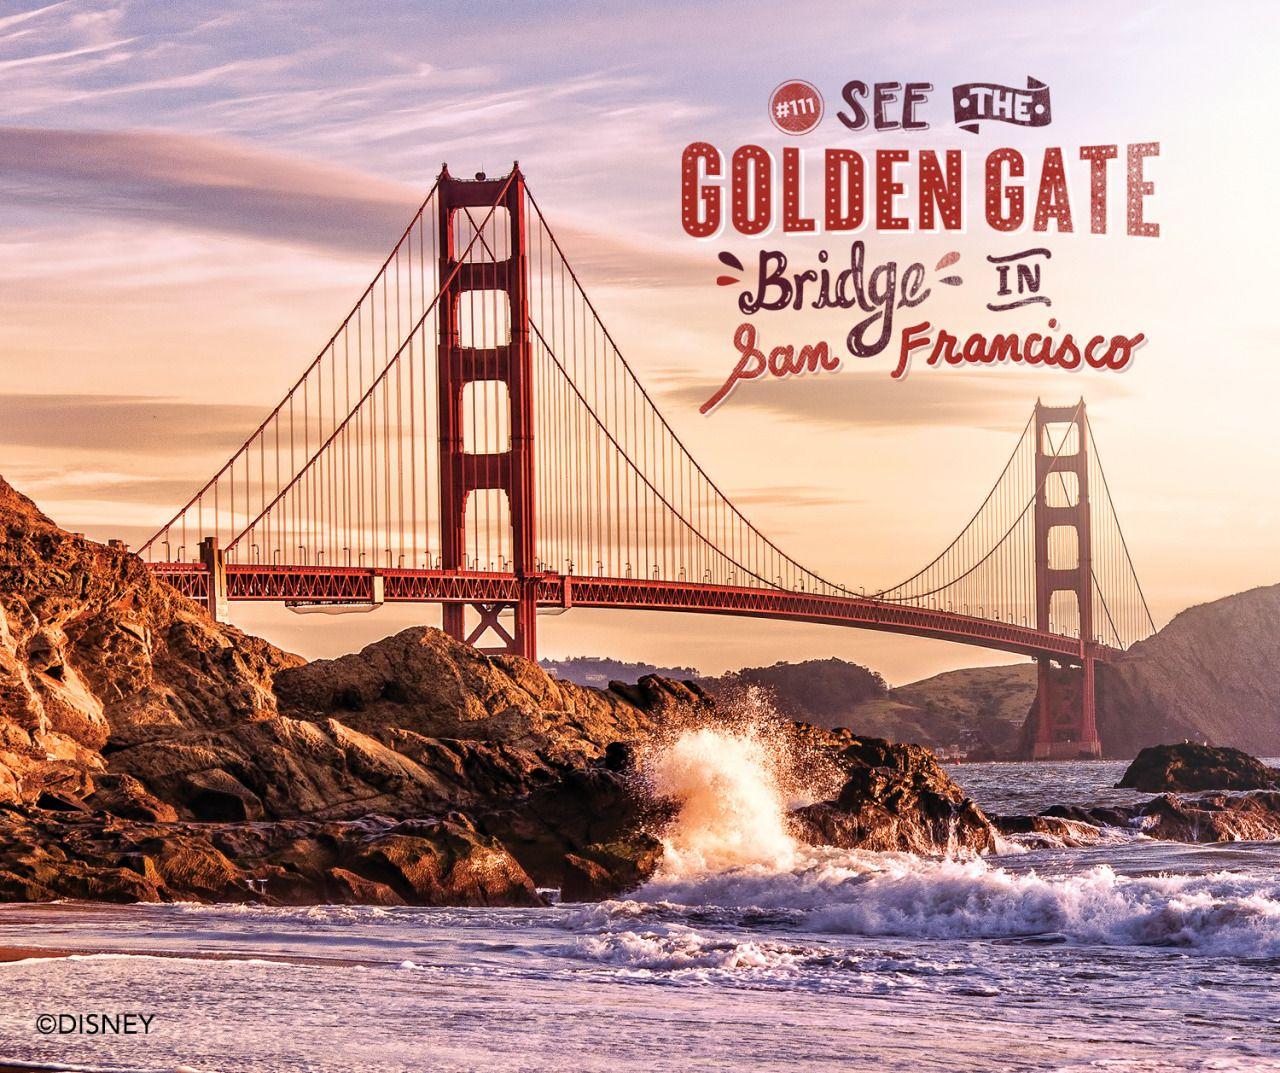 See The Golden Gate Bridge in San Francisco